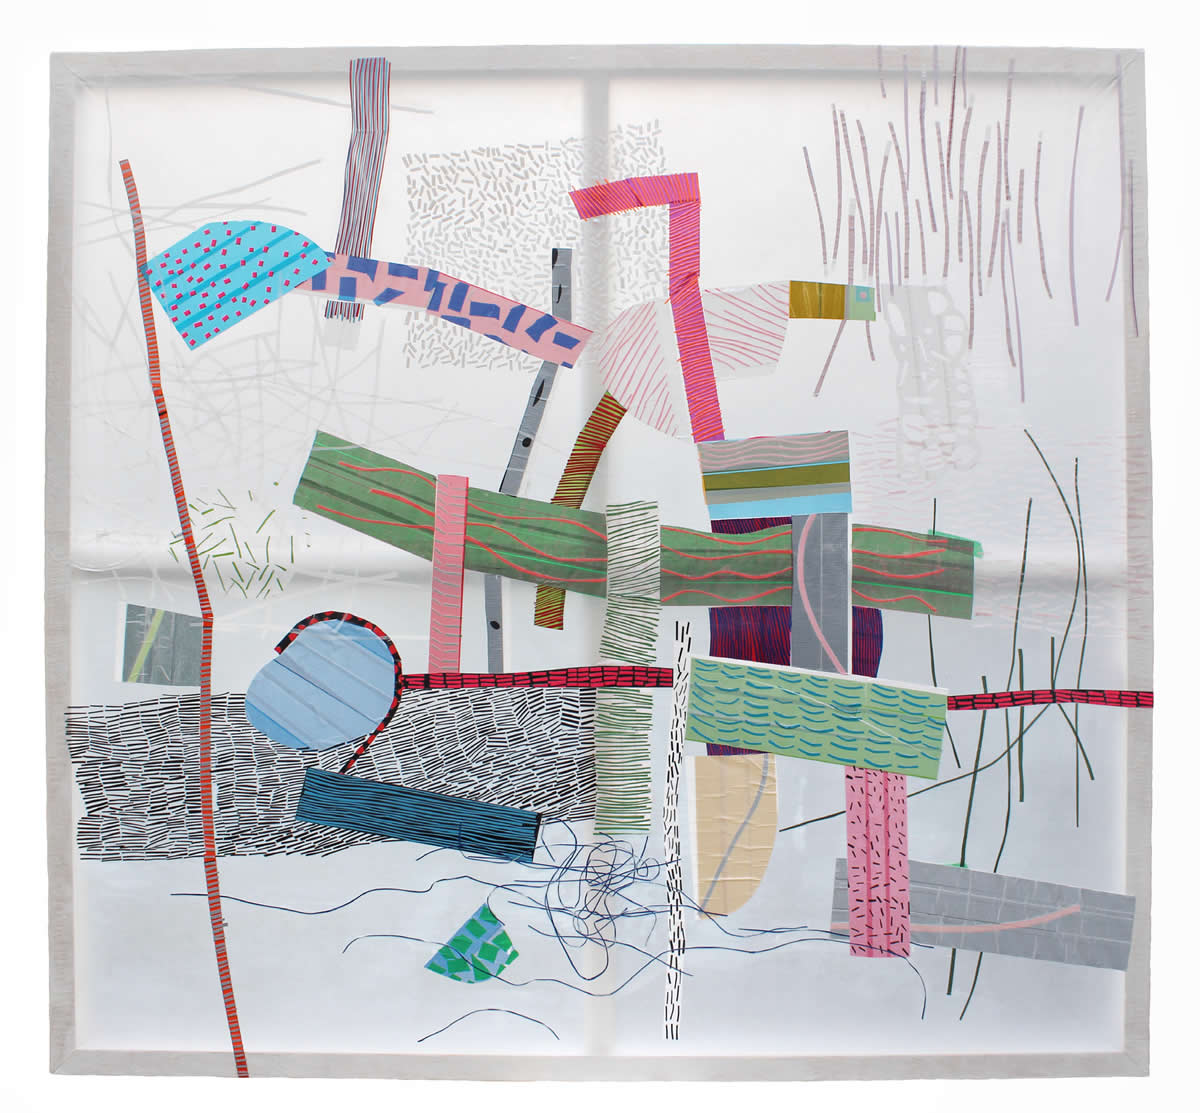 Anthia Loizou | Paper Rhapsodies | Early light symphony | Galerie3